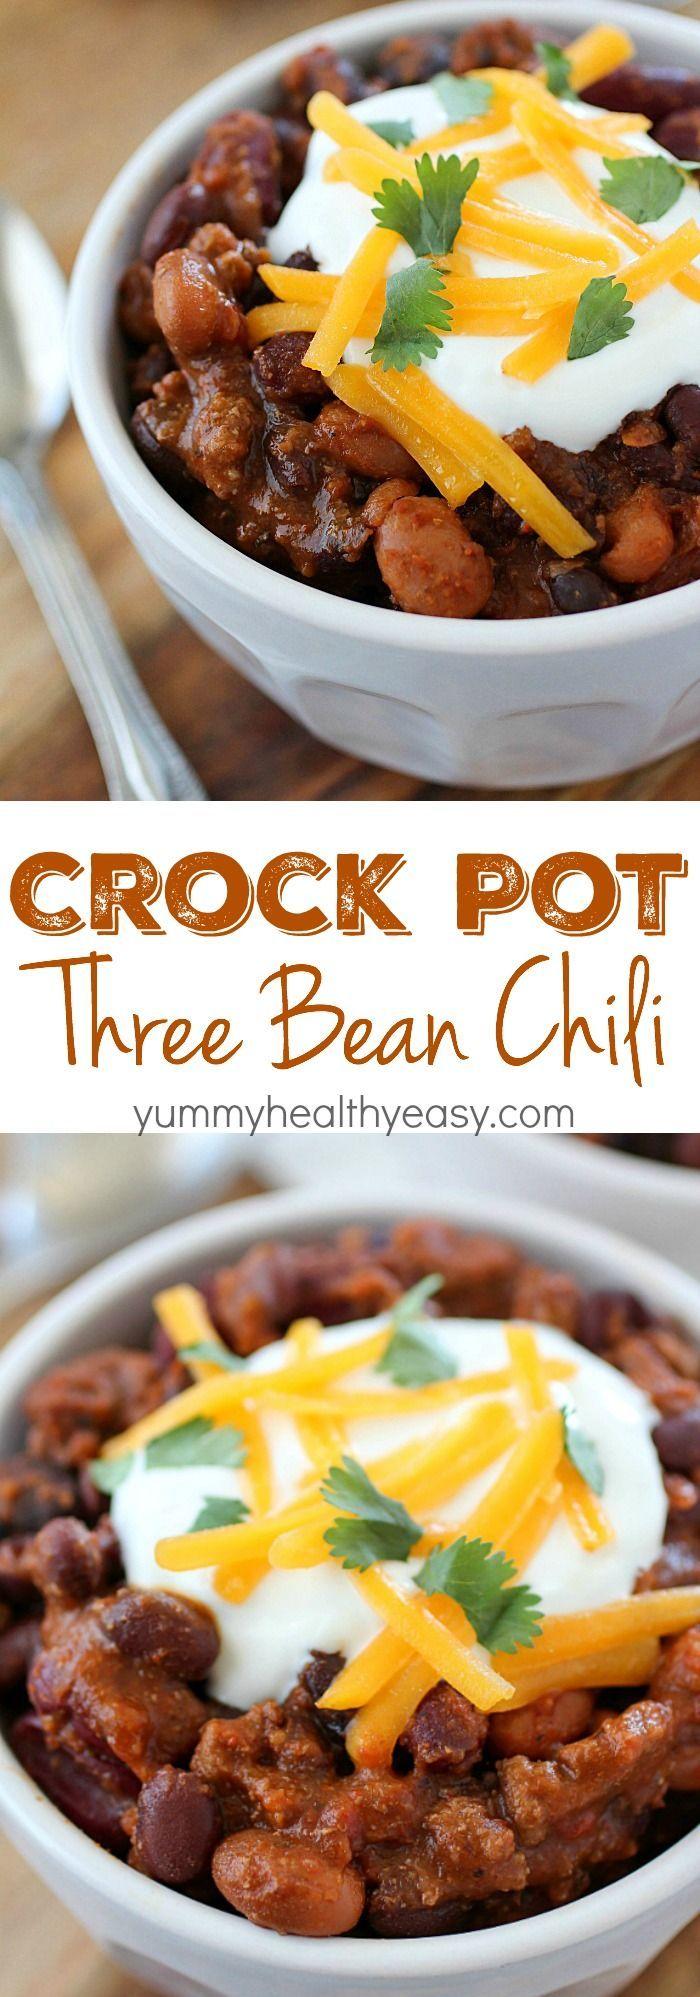 Crock Pot Three Bean Chili | Recipe